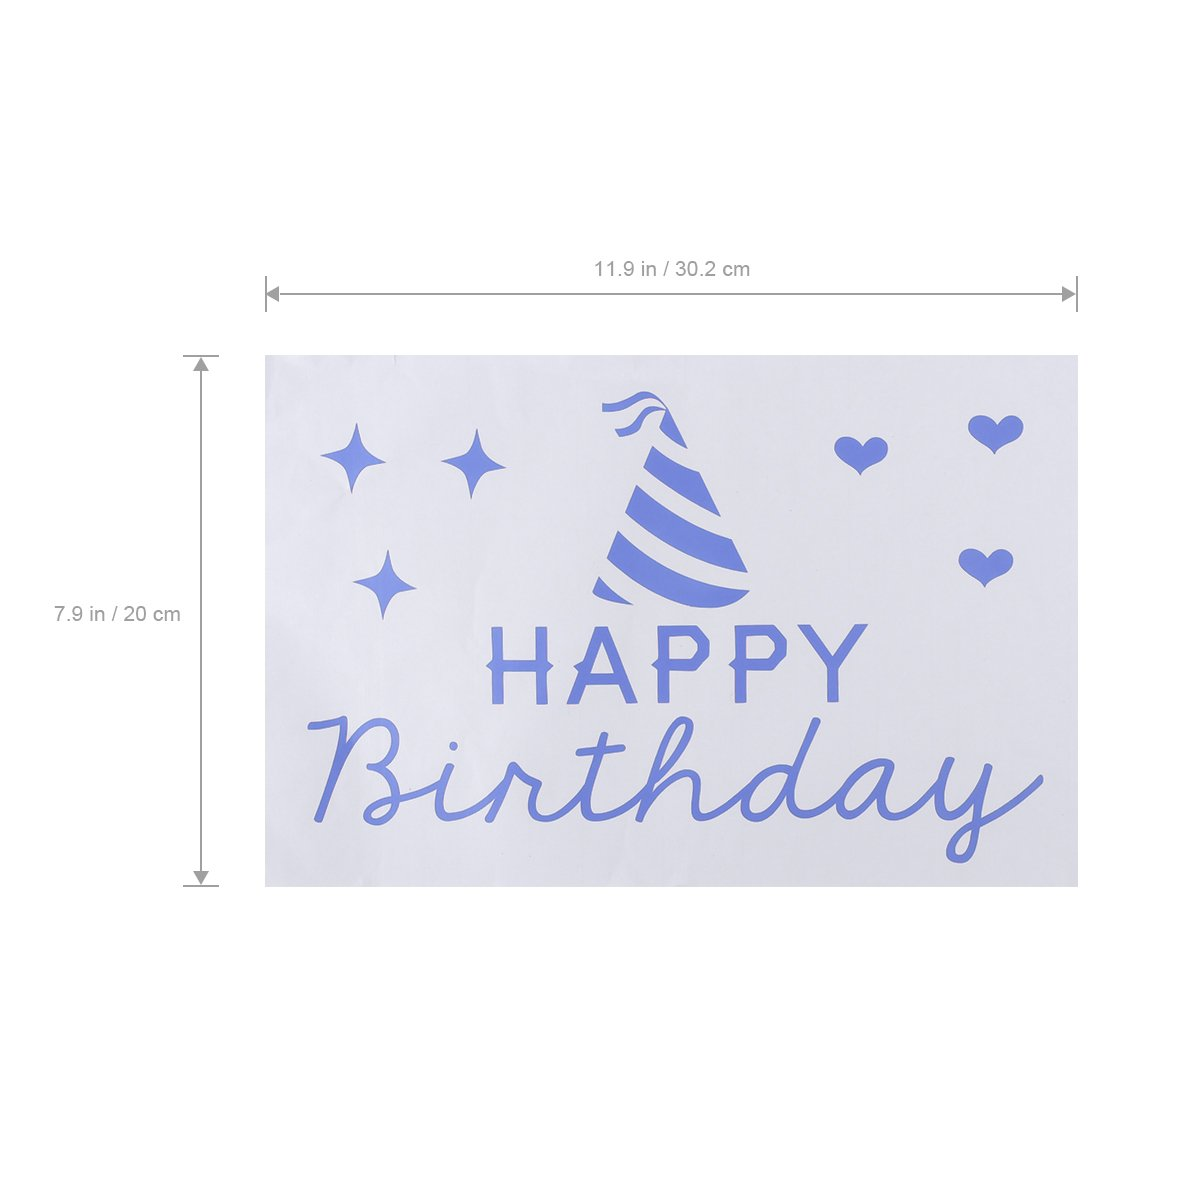 Amazon.com: ROSENICE Wall Quotes Stickers Happy Birthday ...